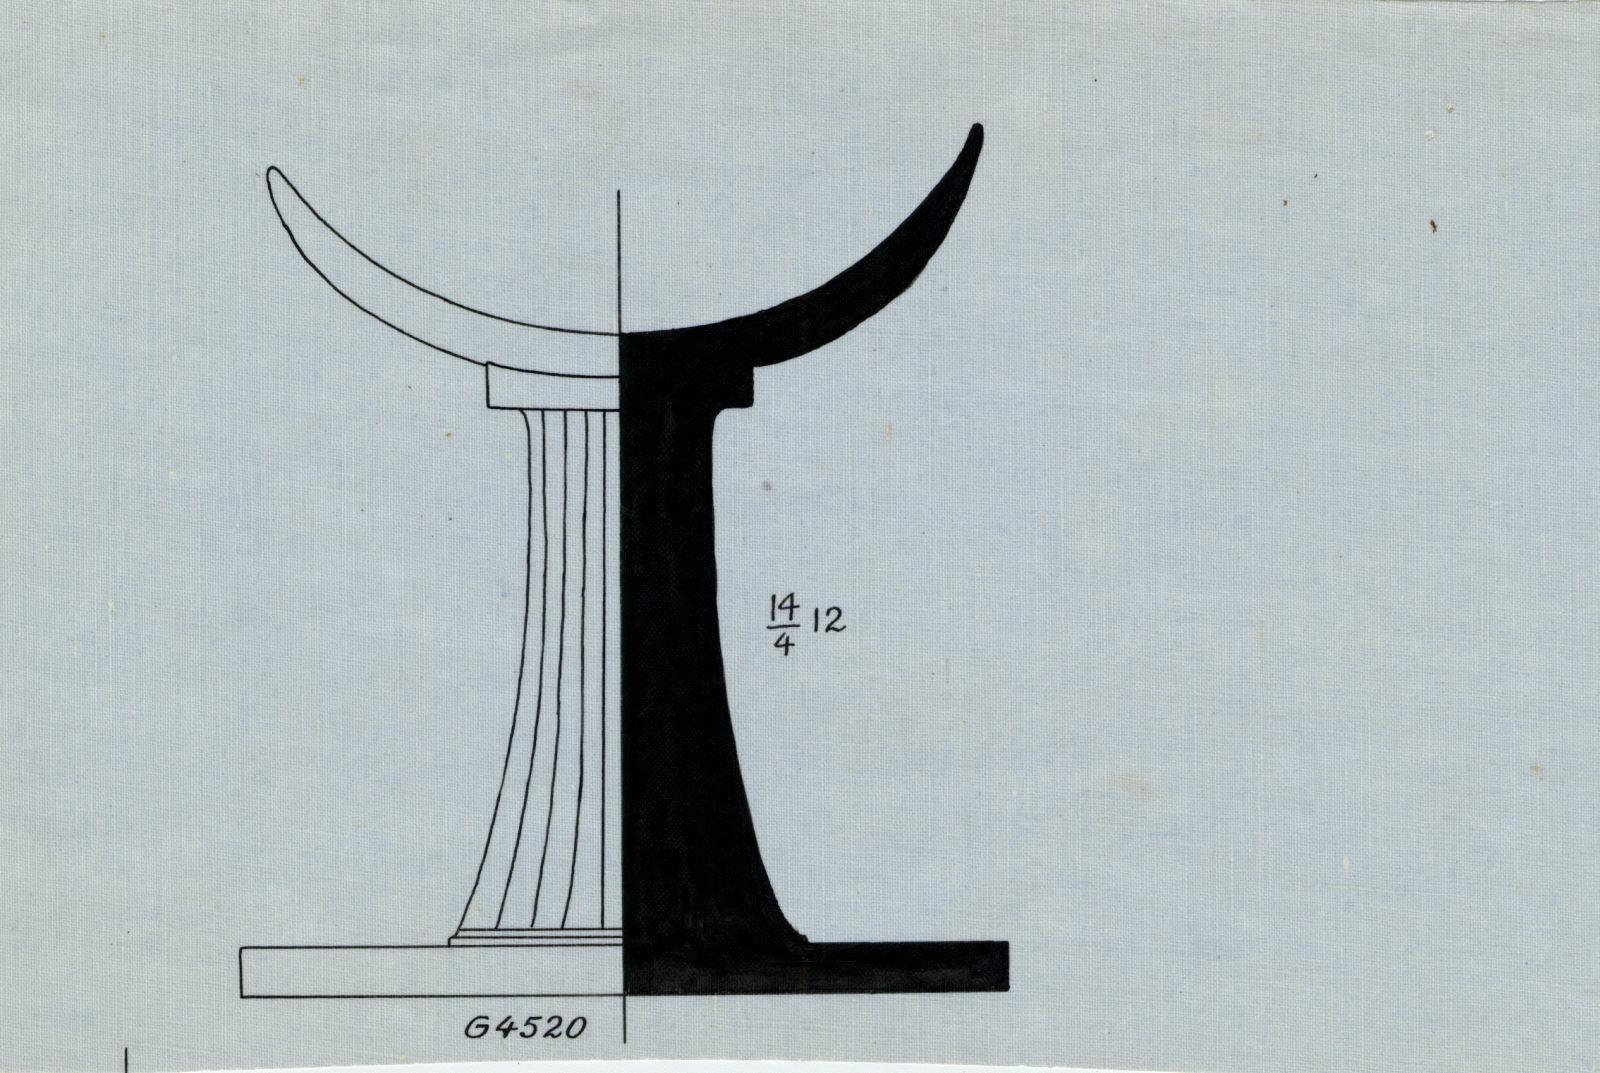 Drawings: G 4520: headrest, alabaster